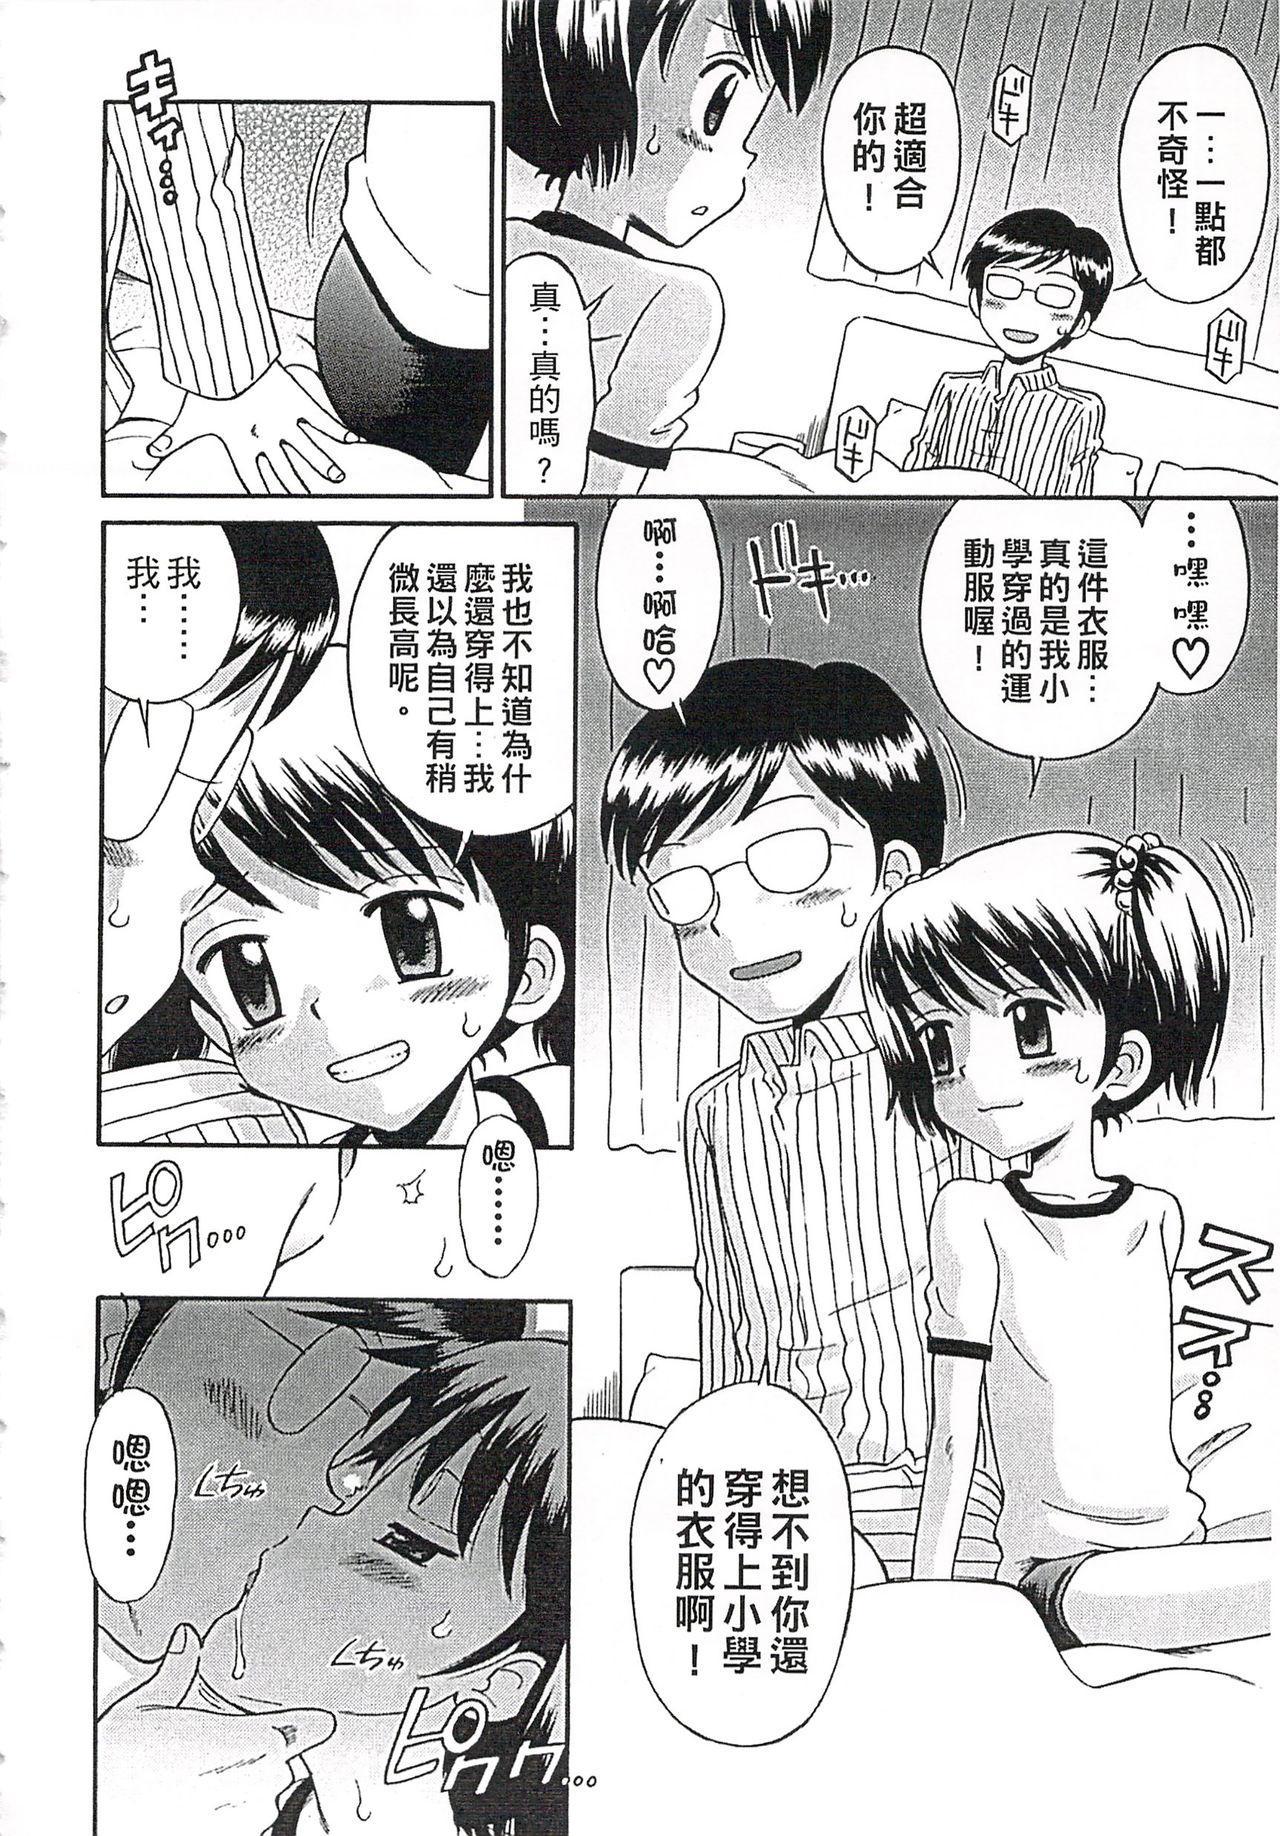 Kore demo Otona Desu Kedo!? Mrs.LOLITA Kanzenban   人家是大人啦! ~Mrs.LOLITA完全版 15